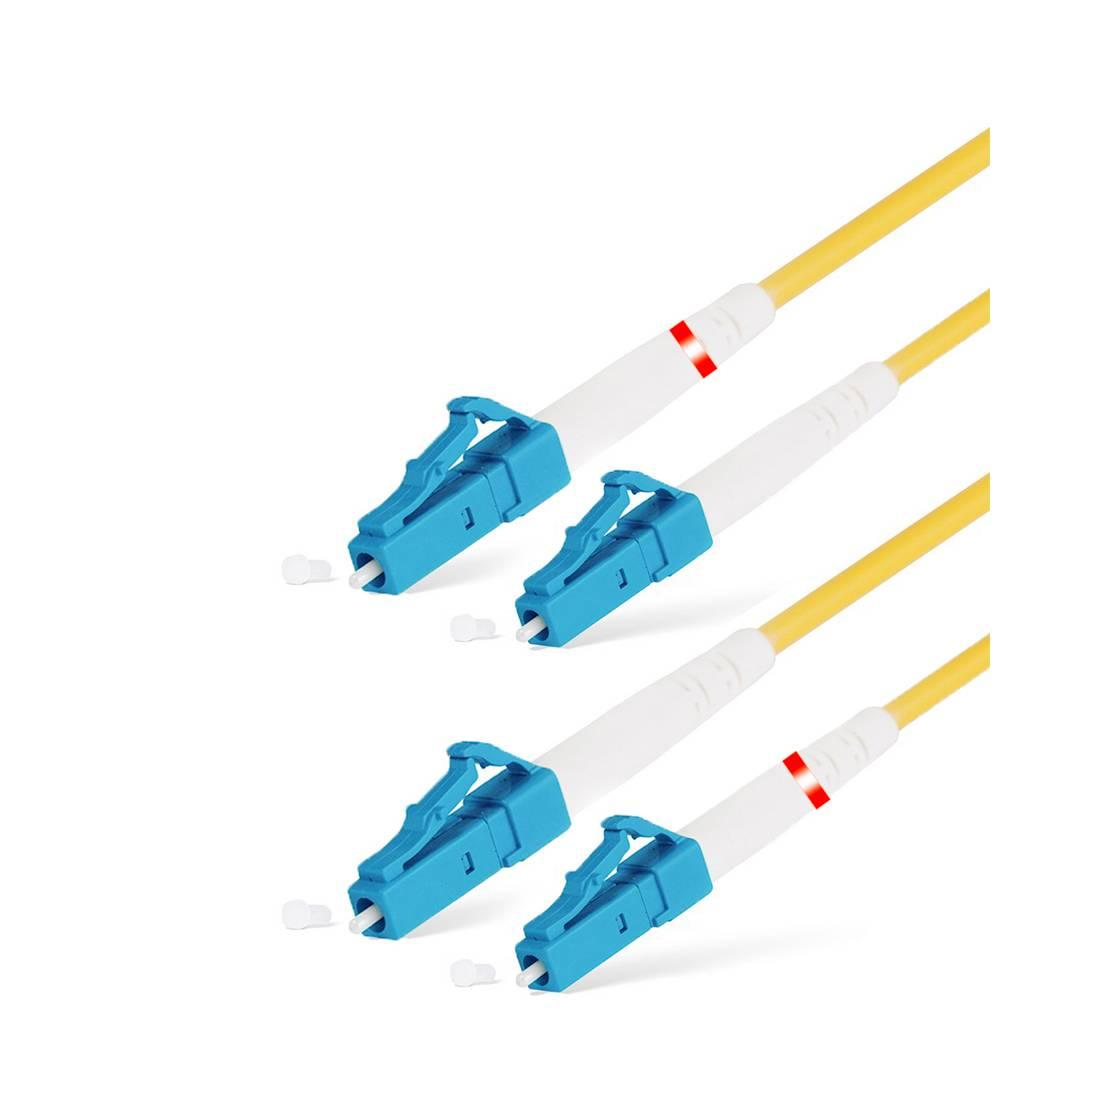 Шнур оптический (патч-корд) 2-LC 9-1